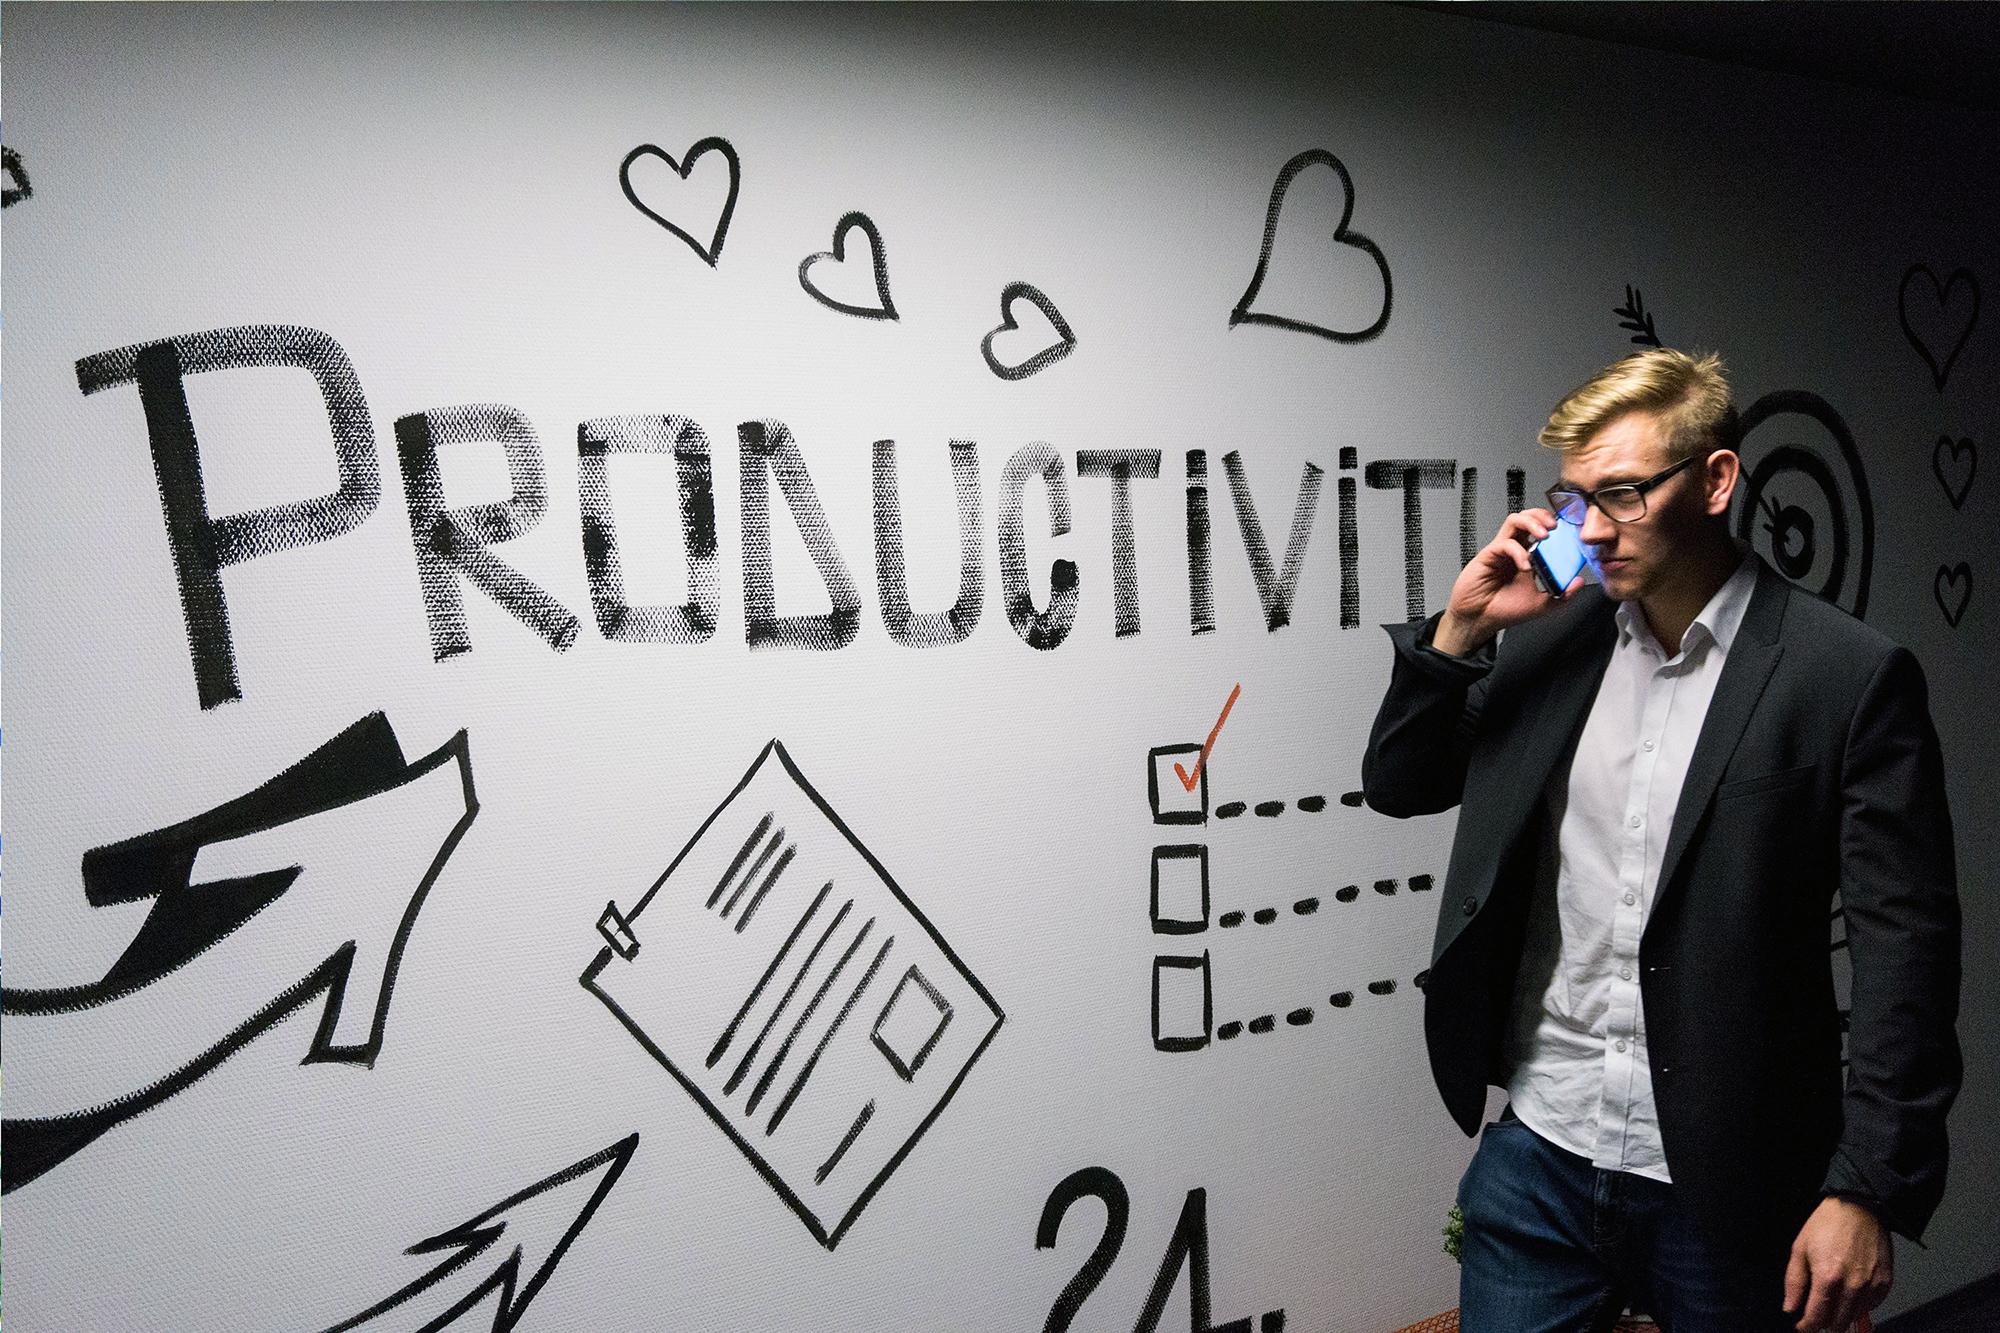 Productivity mindset during COVID-19